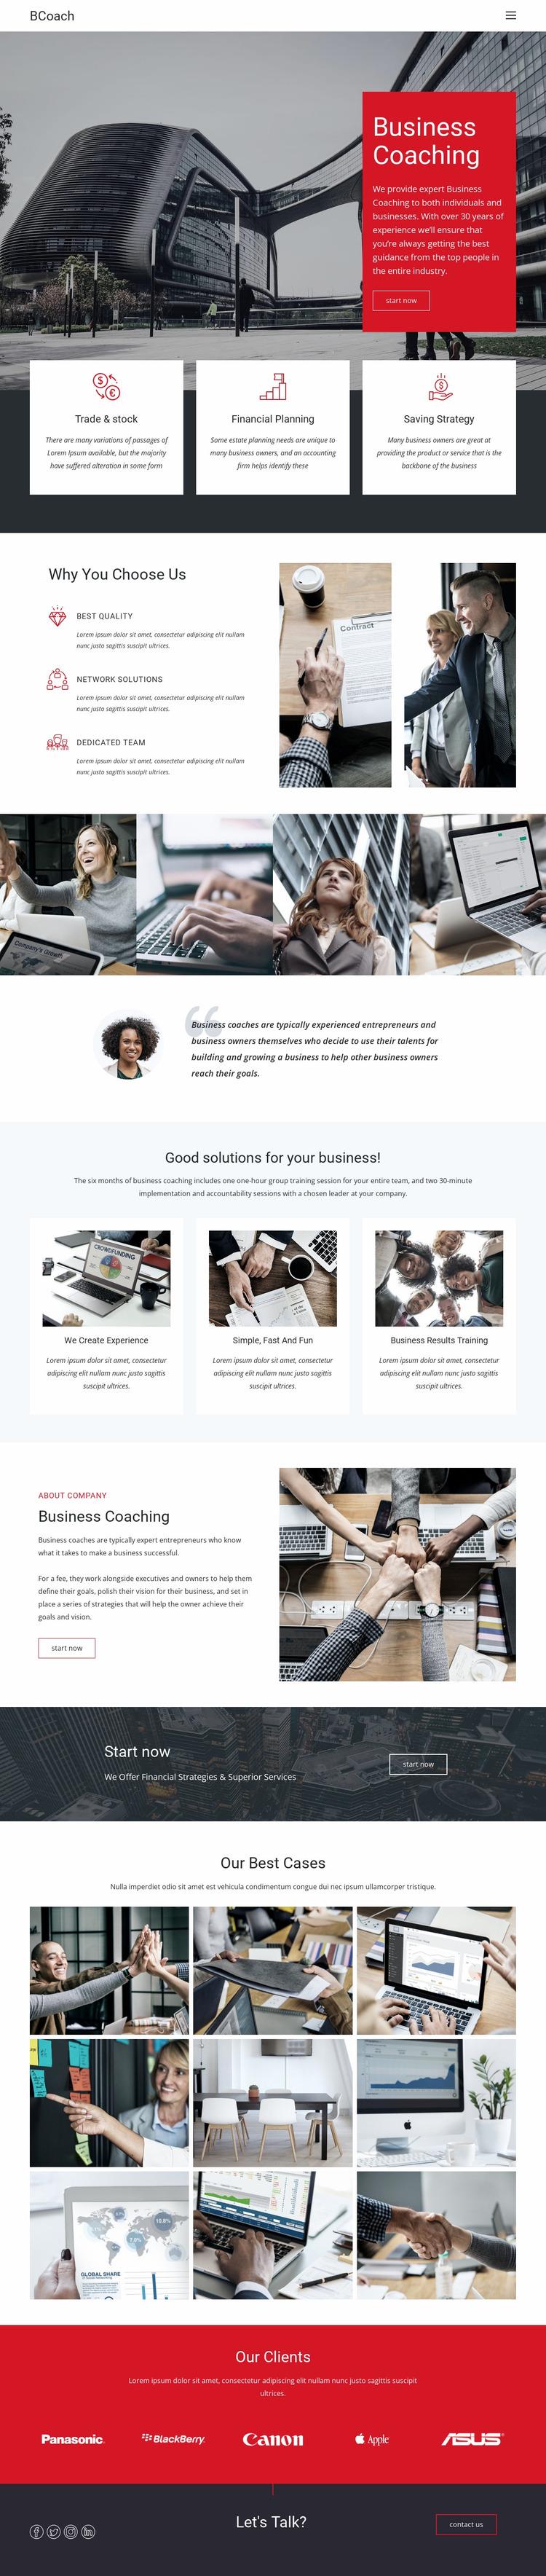 Executive coaching Website Mockup